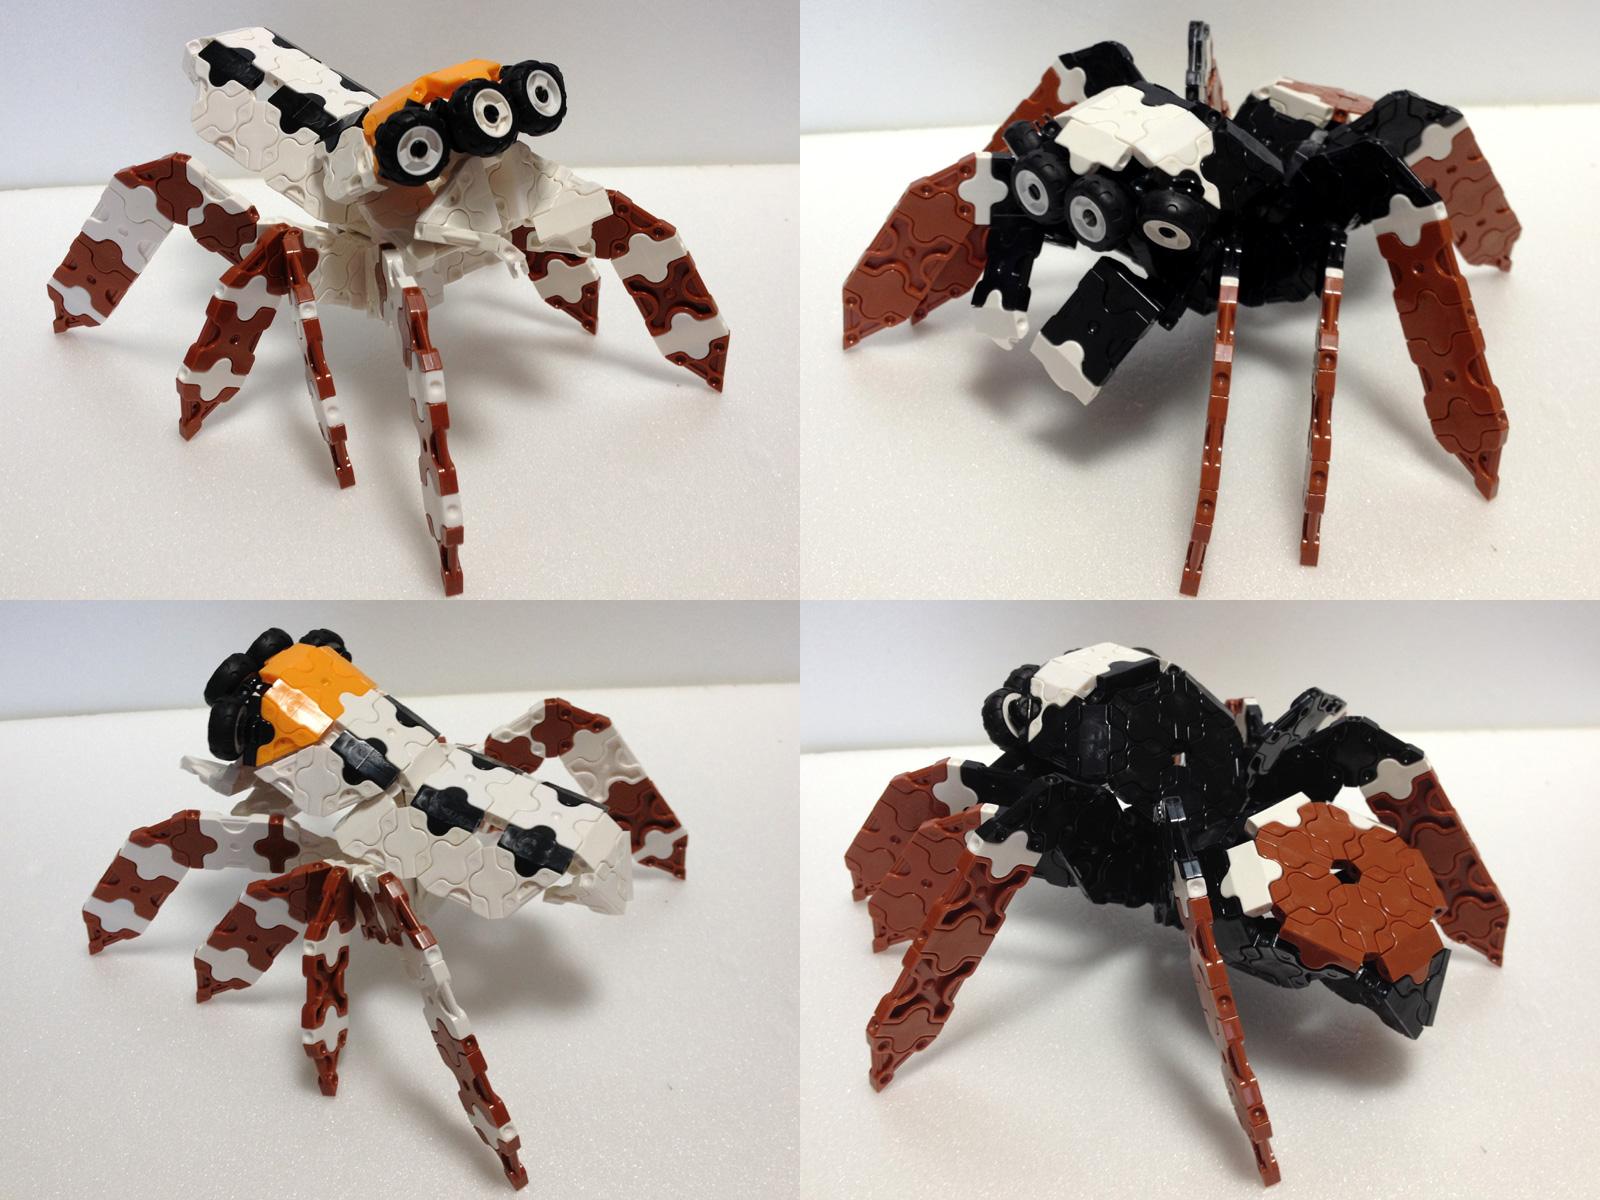 Spider5_IMG_0553.jpg